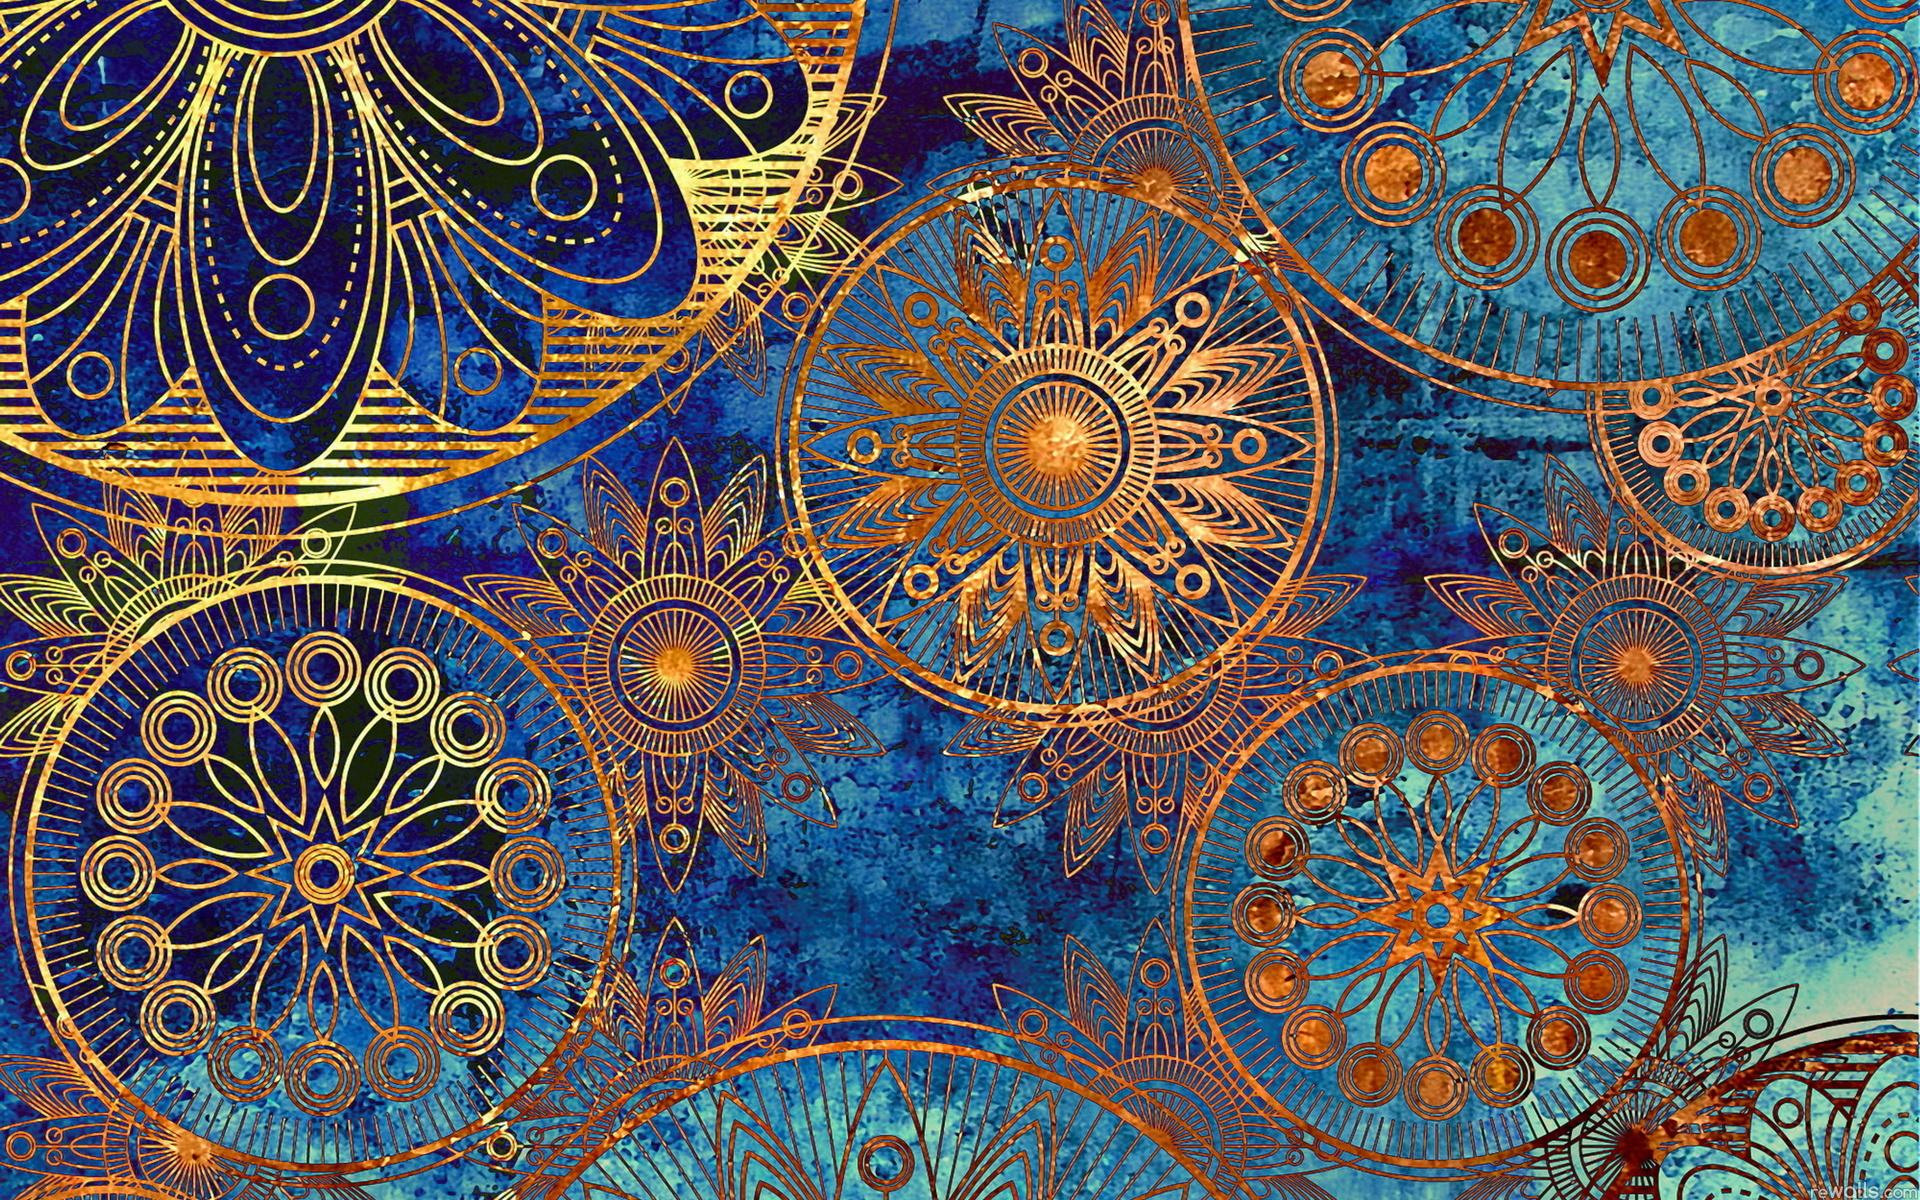 antique wallpaper background wallpapersafari